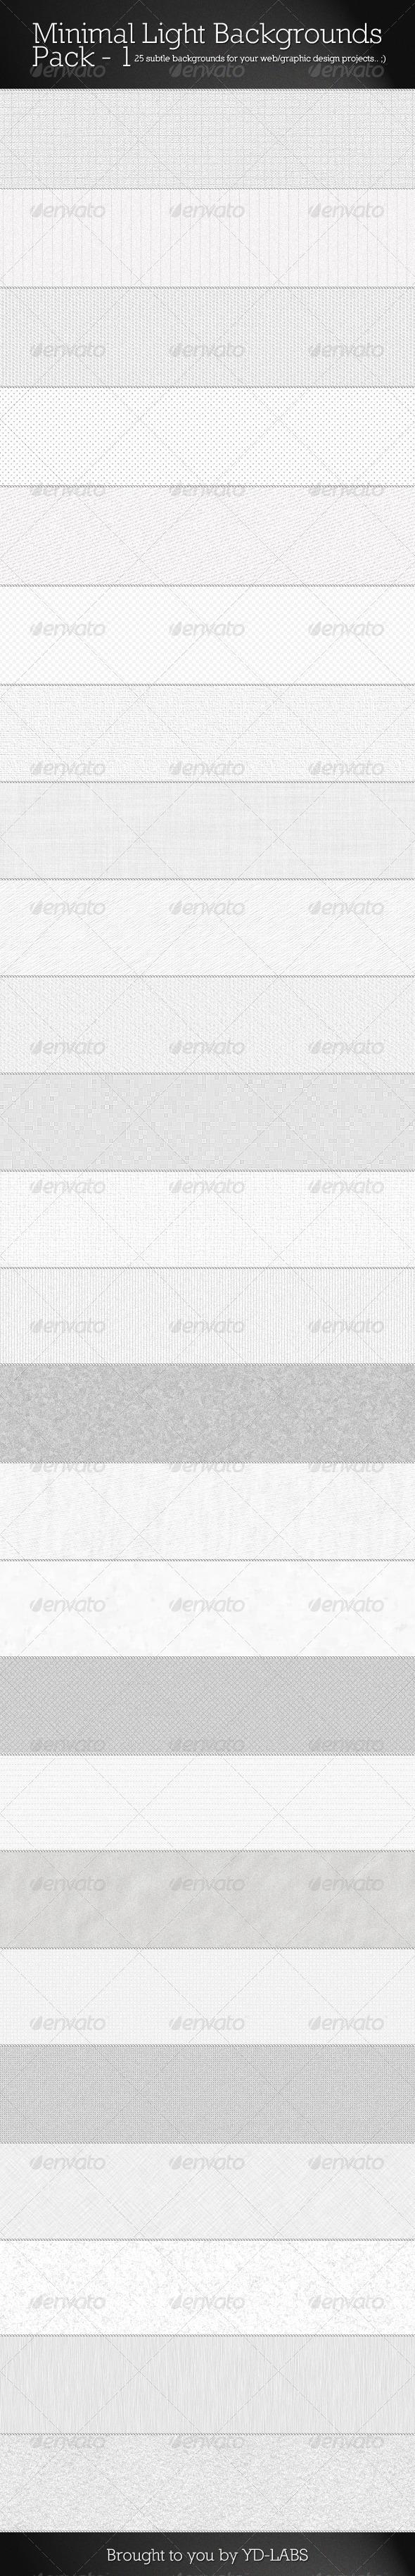 http://static.tumblr.com/eb80zsh/WGAnlw46n/minimal-light-backgrounds-pack-1.jpg